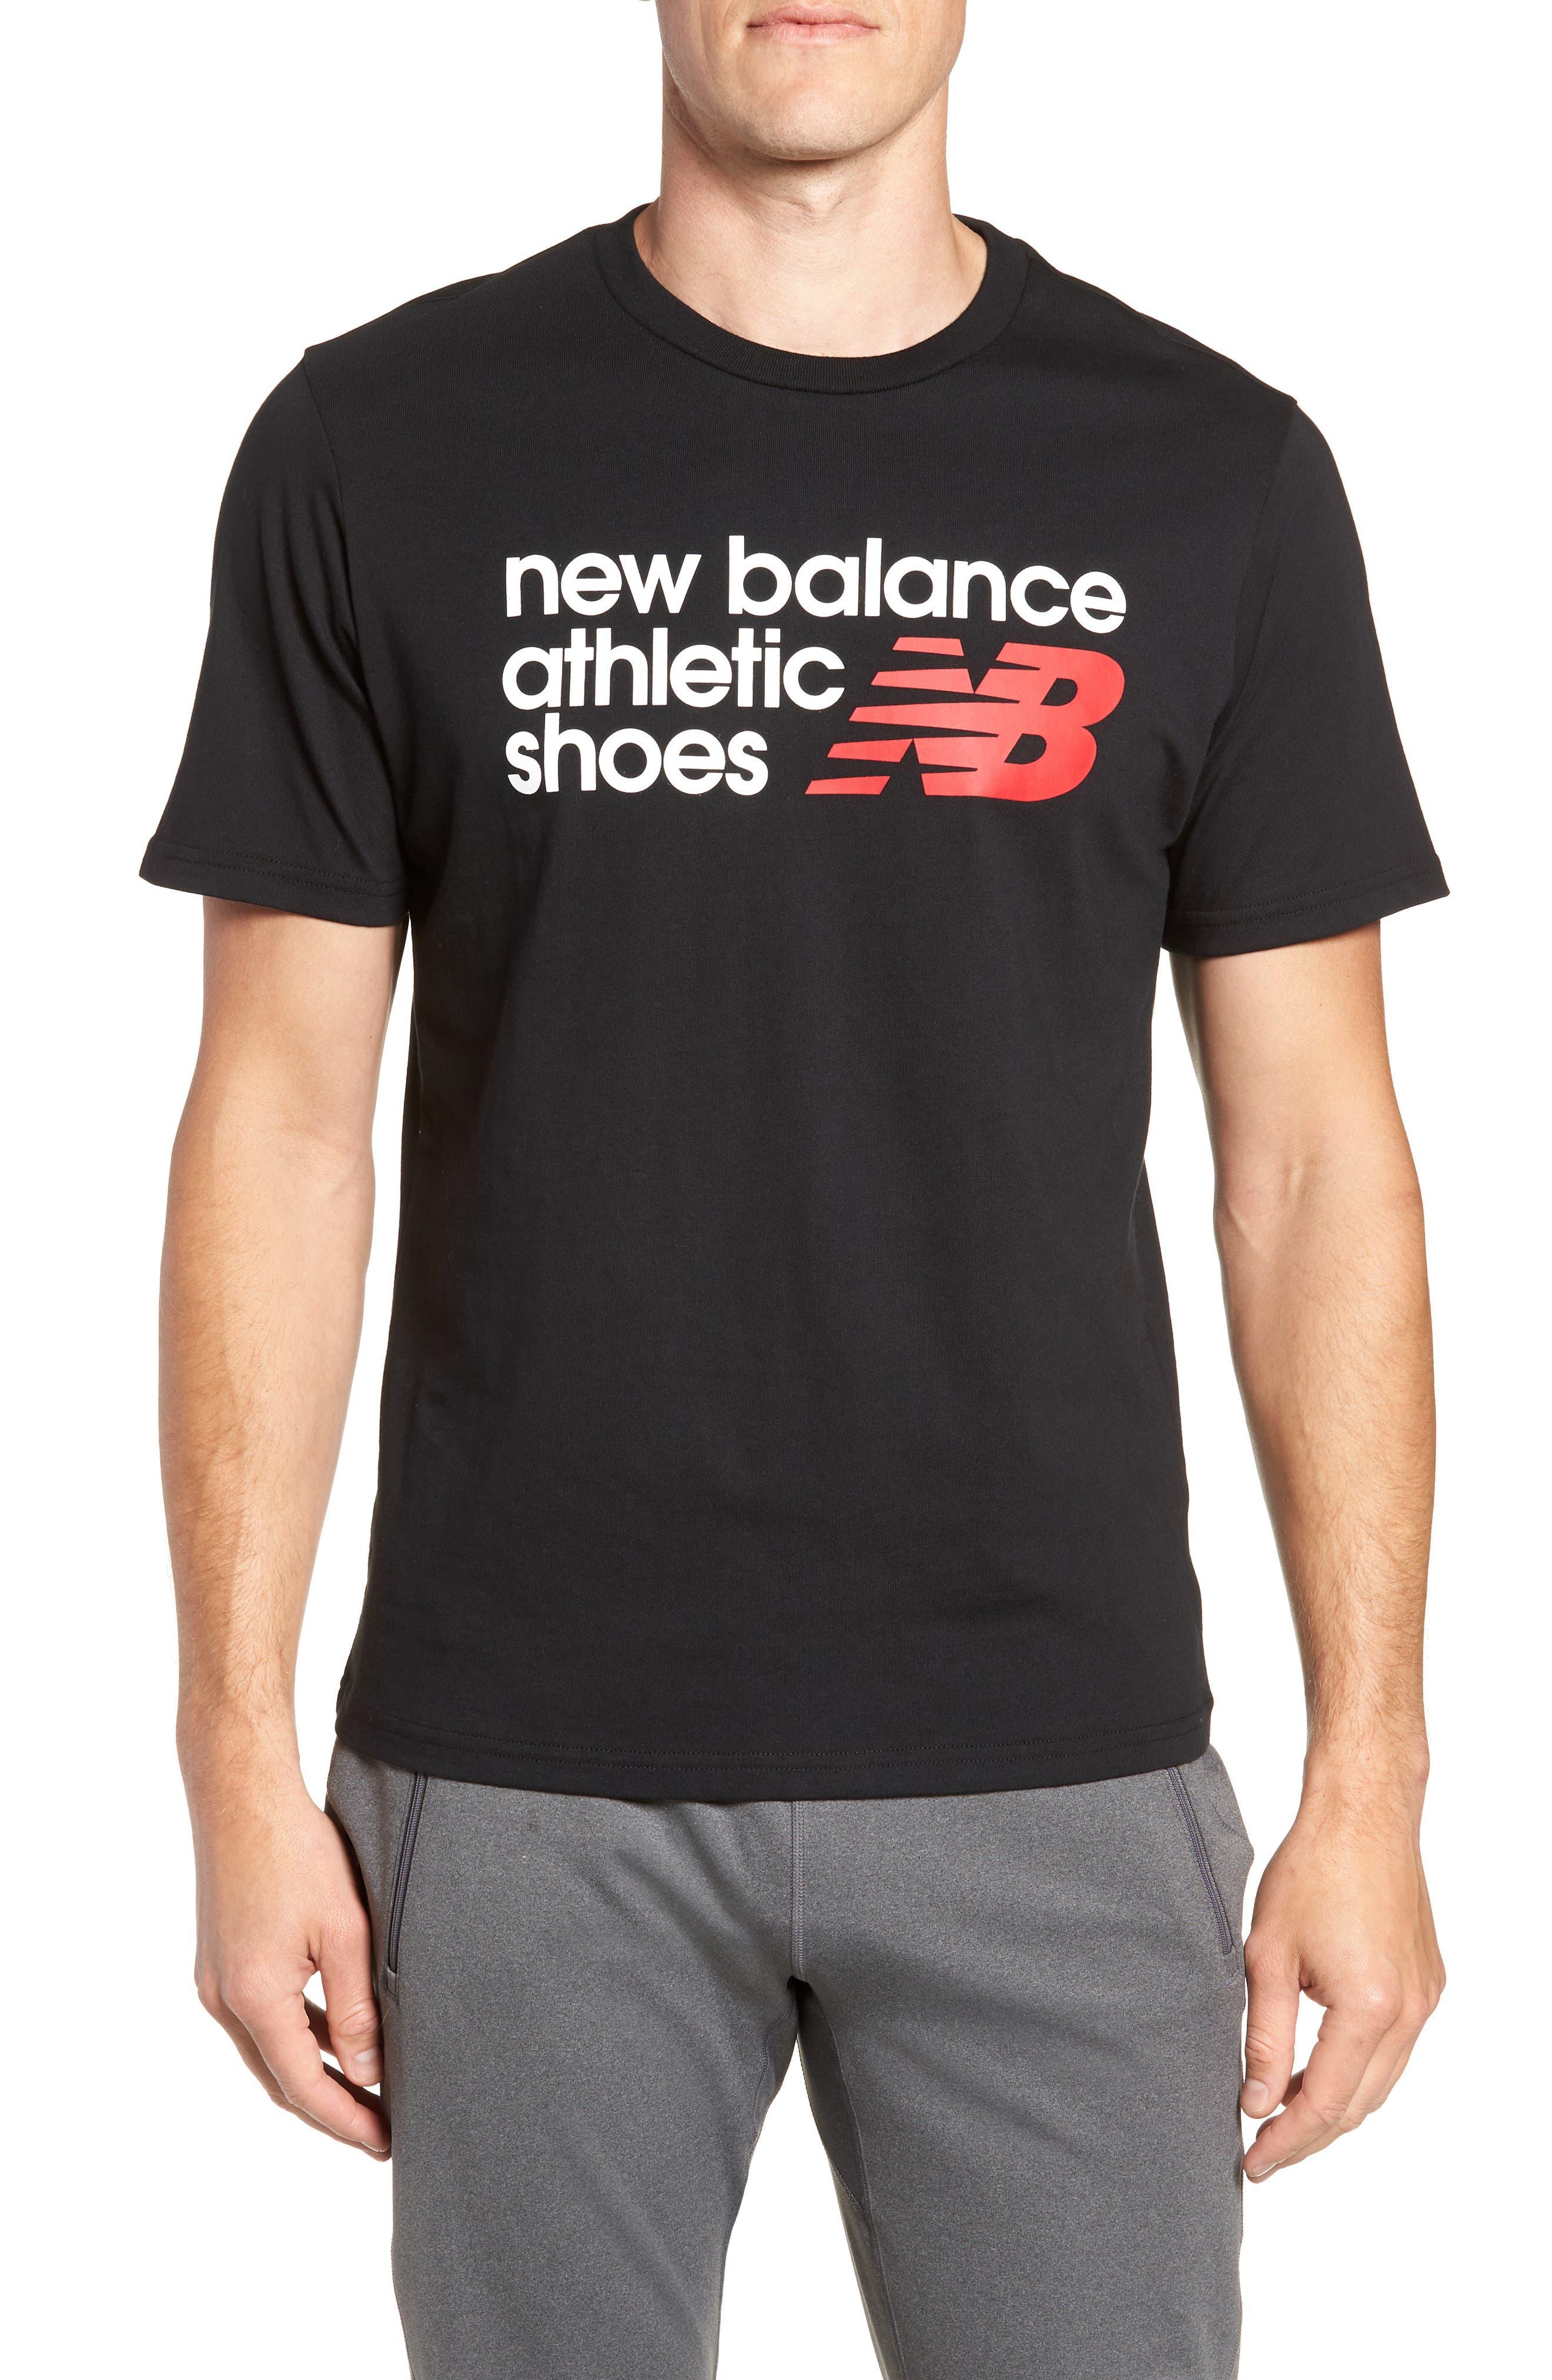 New Balance Nb Shoe Box Graphic T-Shirt, Black